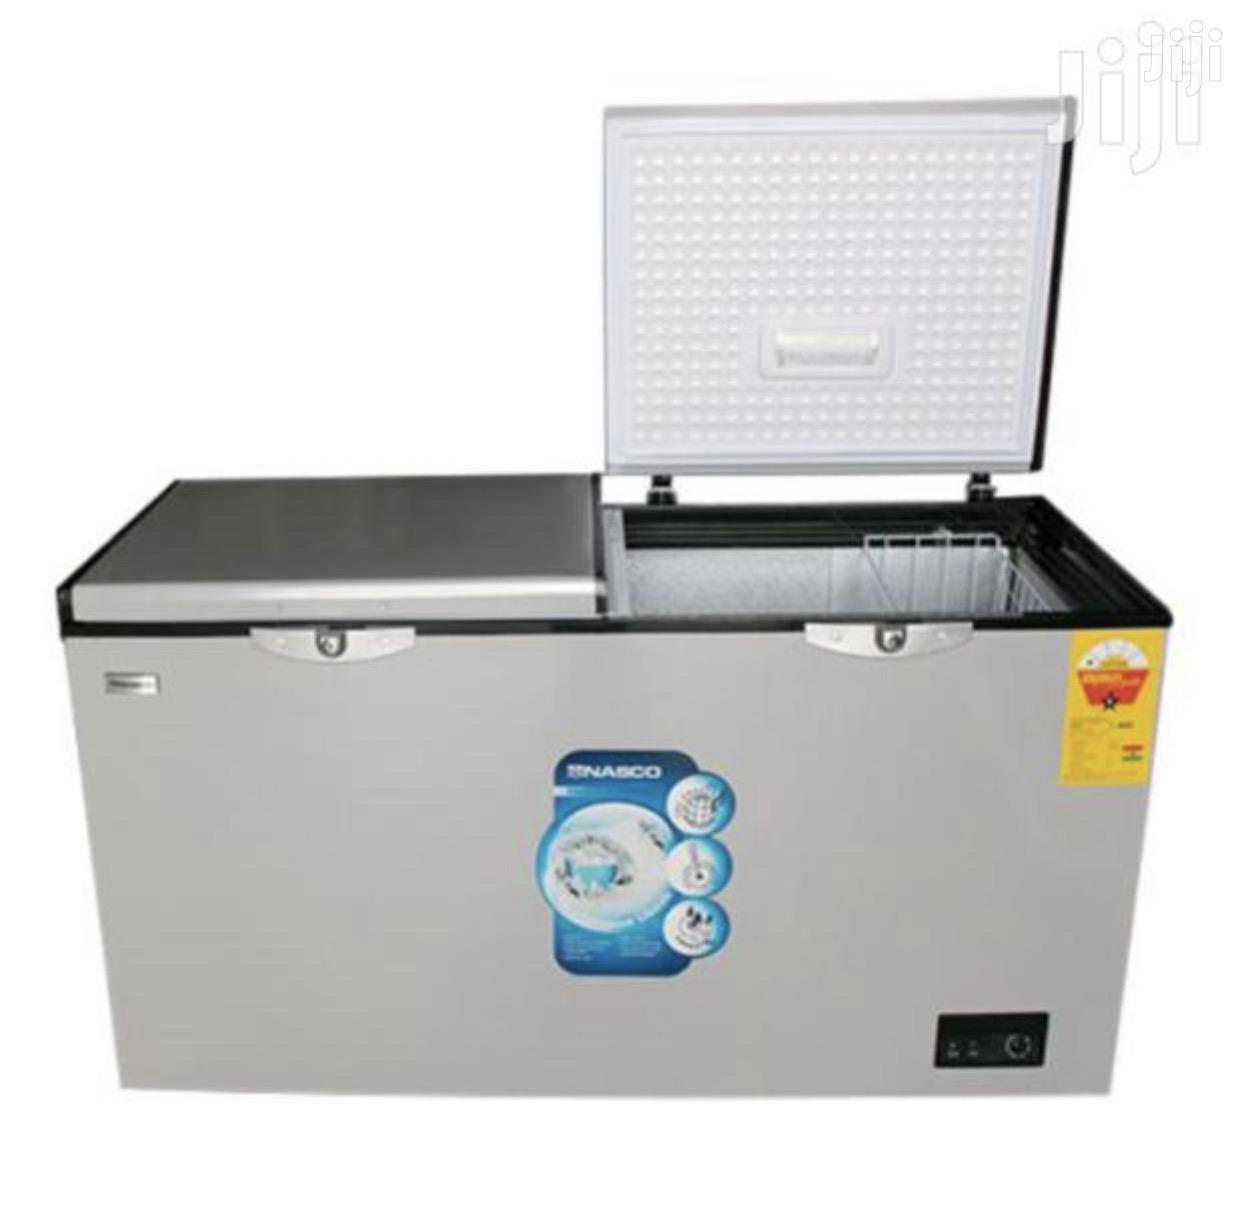 Nasco 400 Ltr Chest Freezer (Nas-500x)